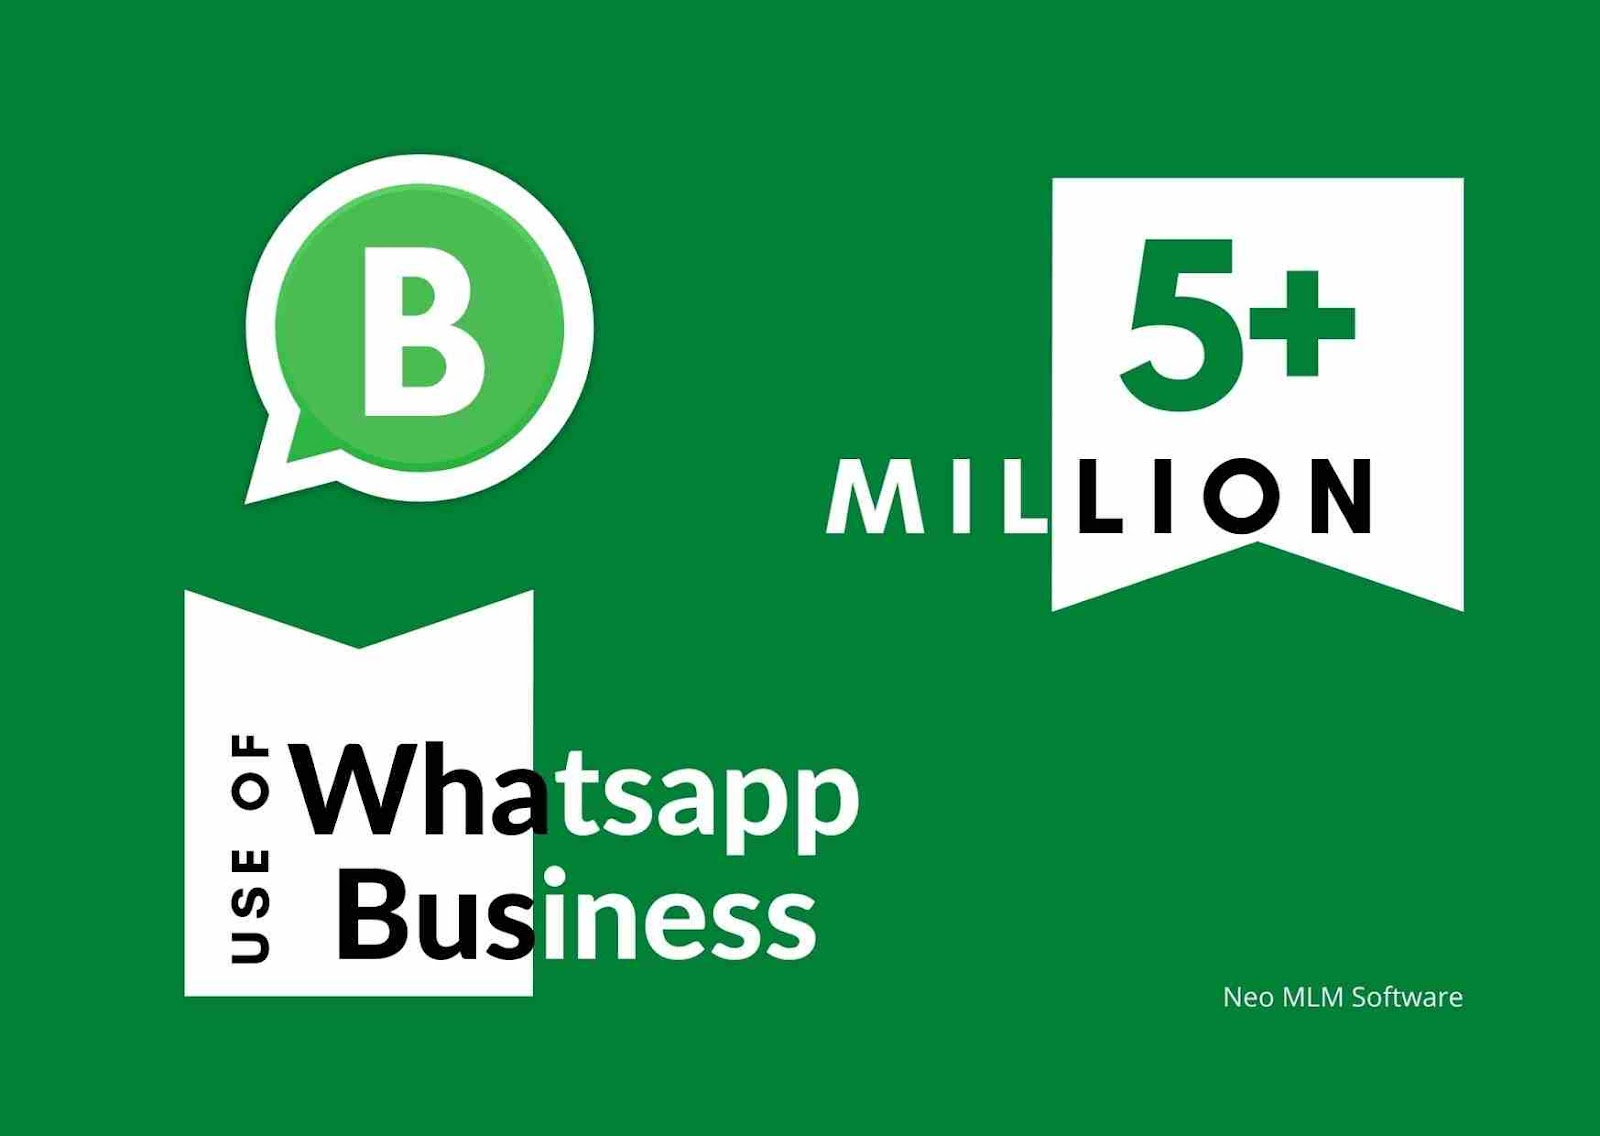 Whatsapp Business Use | Whatsapp MLM